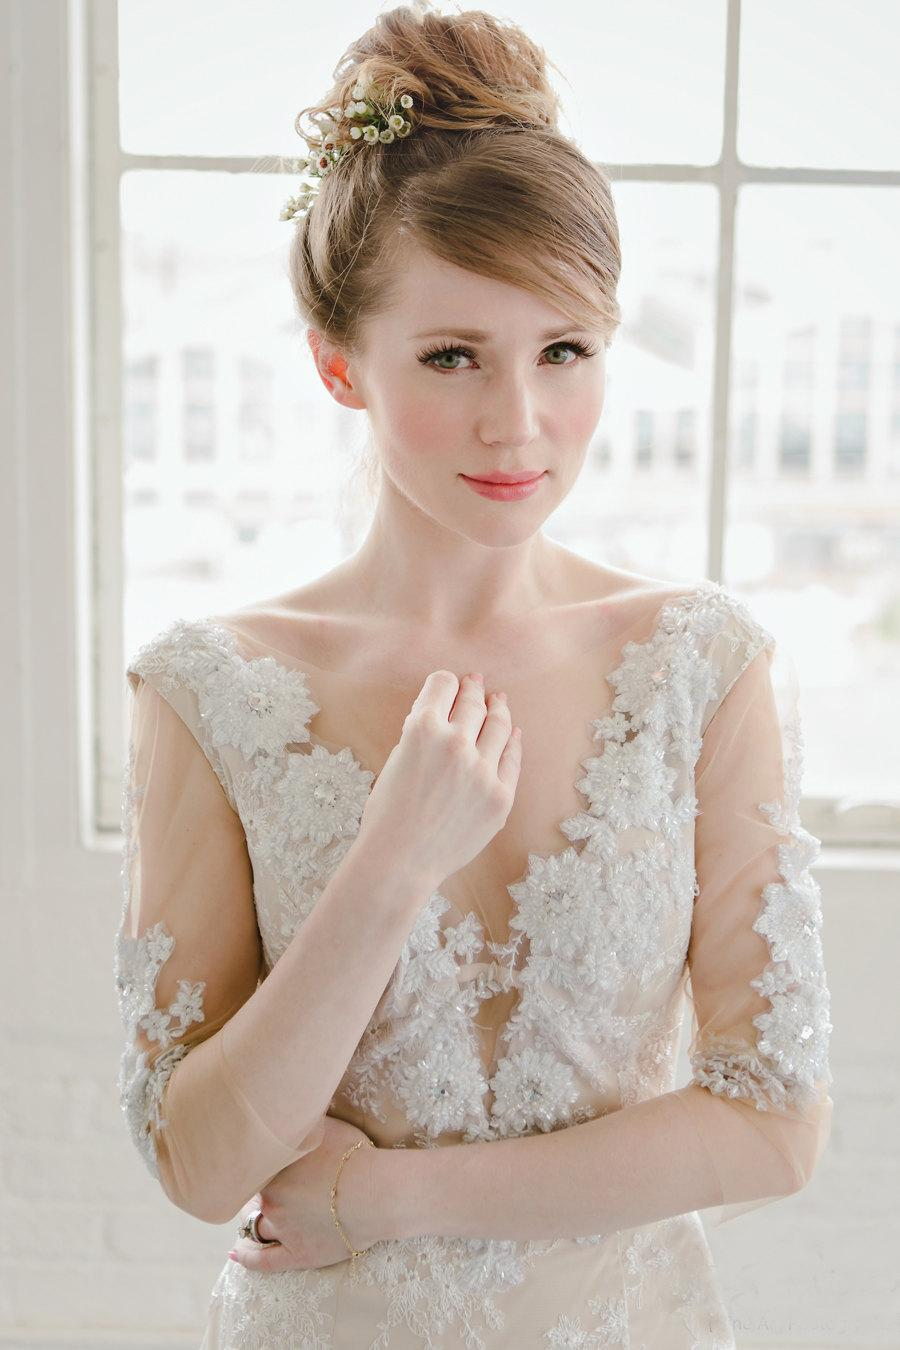 fitted wedding dresses low back wedding dress Berta Fall Wedding Dresses